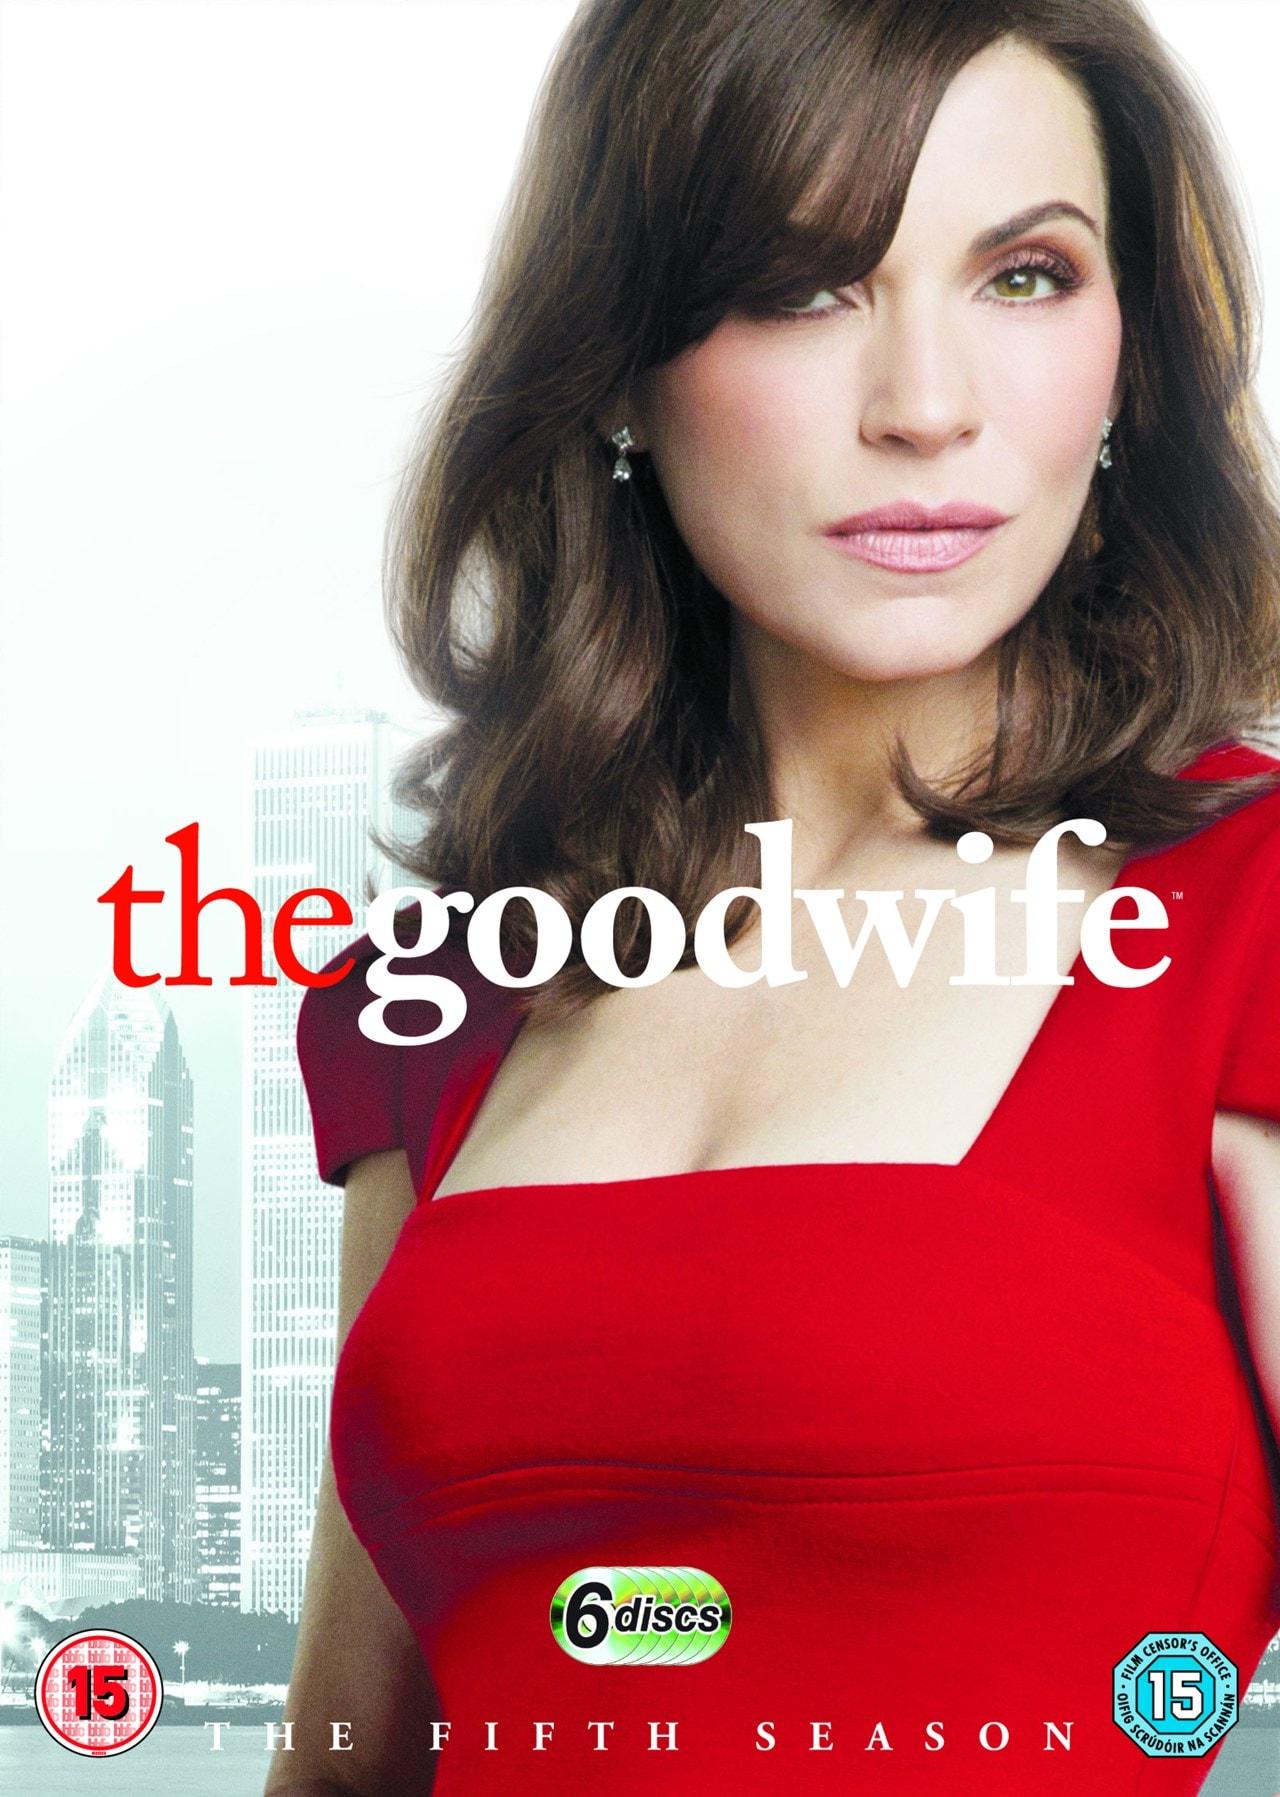 The Good Wife: Season 5 - 1